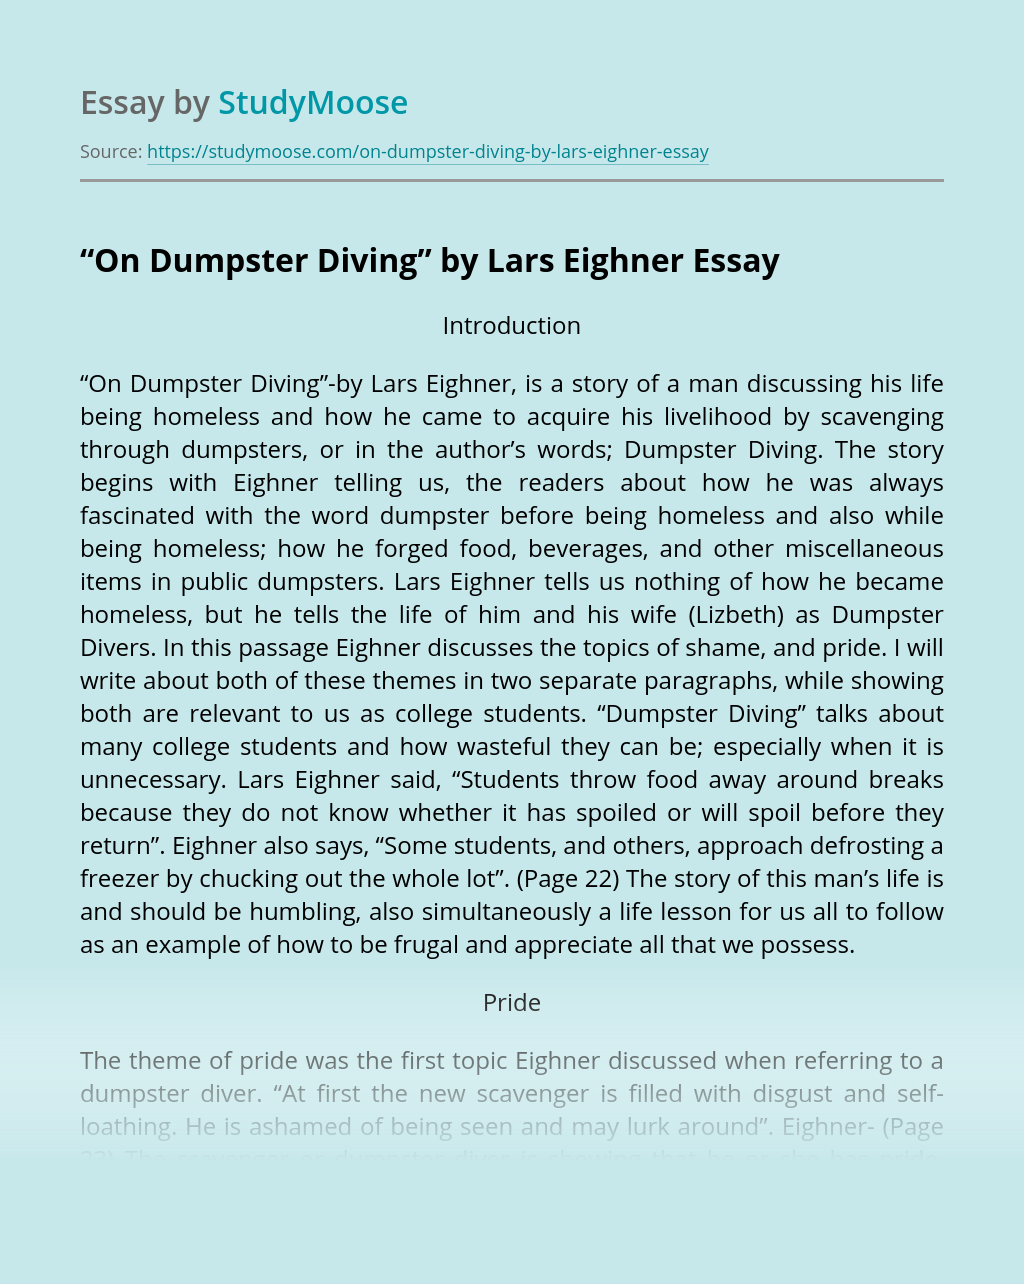 """On Dumpster Diving"" by Lars Eighner"